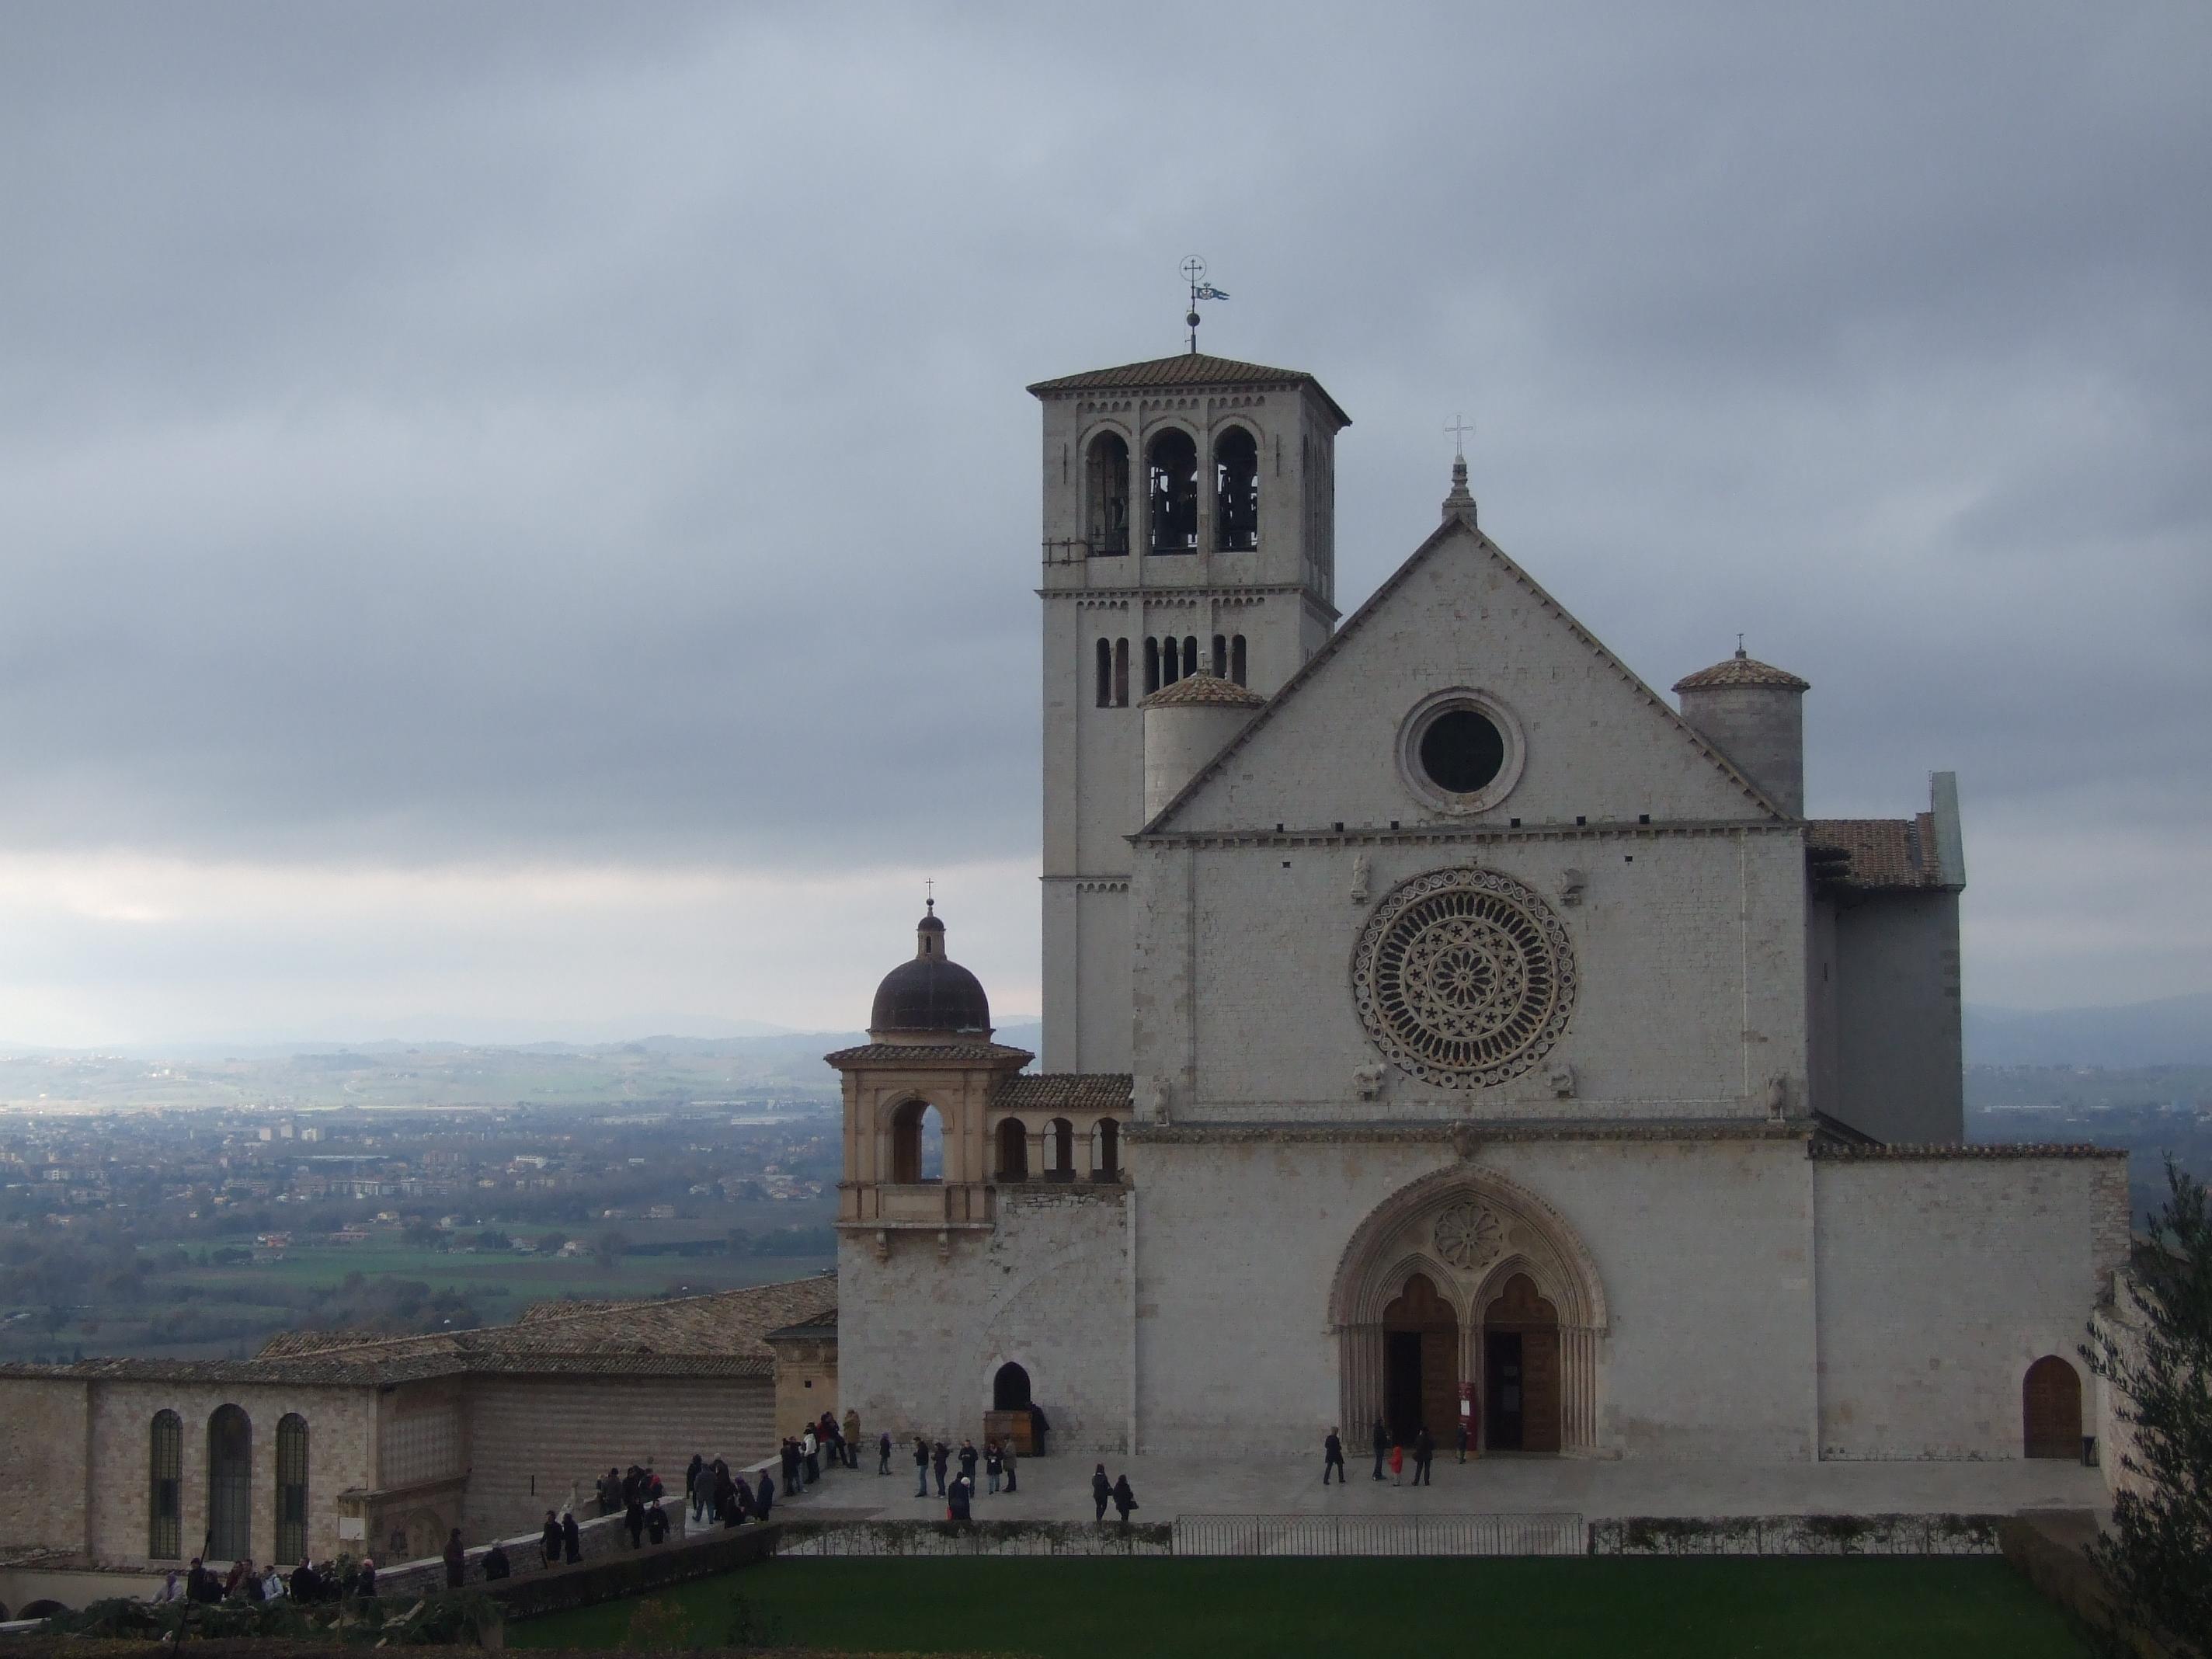 Basilica of Saint Francis of Assis